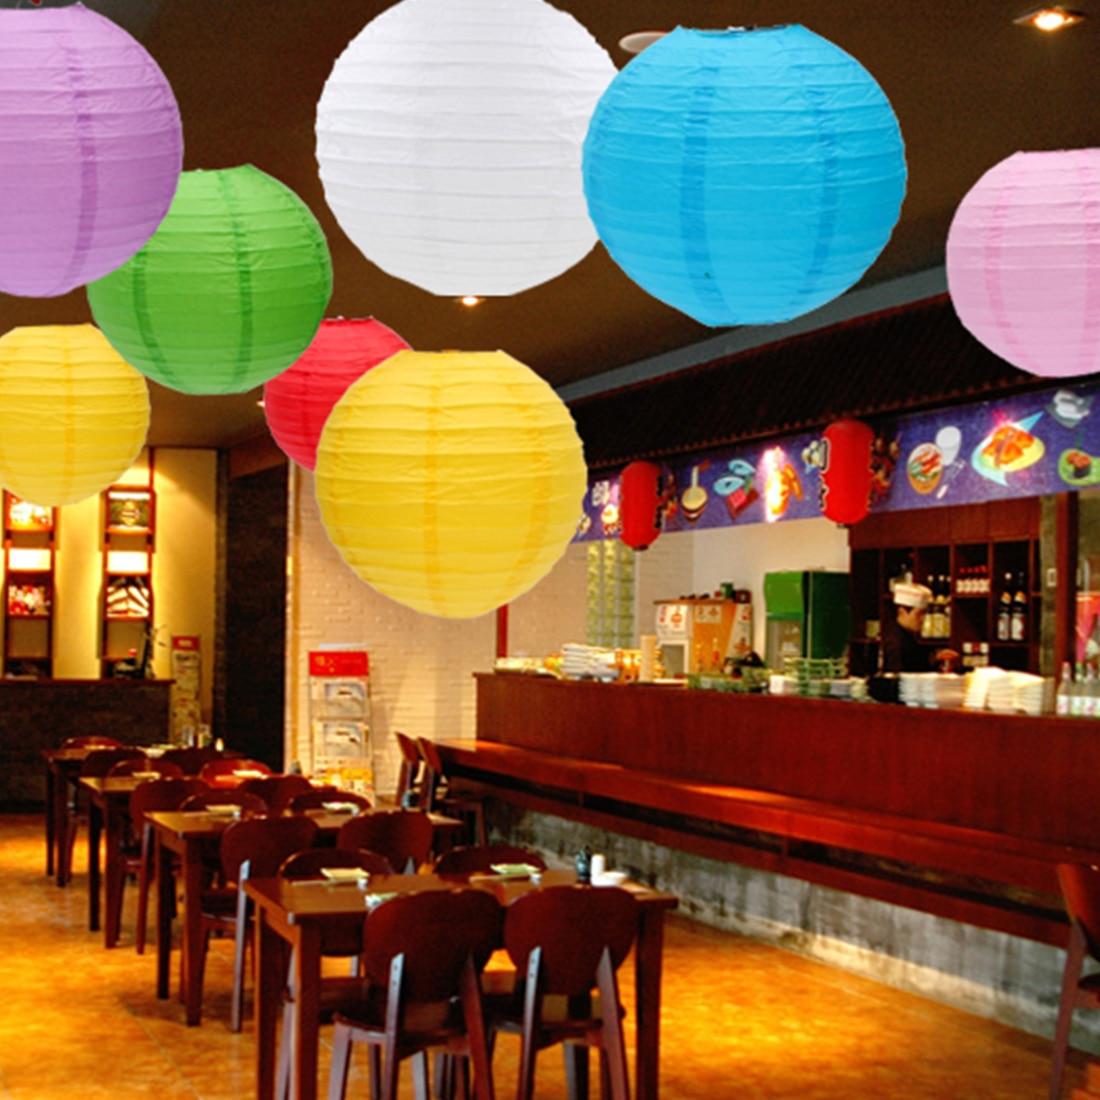 US $3 46 6% OFF|1/5Pcs Round Chinese Paper Lantern Birthday Wedding Party  Decor Craft DIY Lampion White Hanging Lantern Ball Party Supplies-in